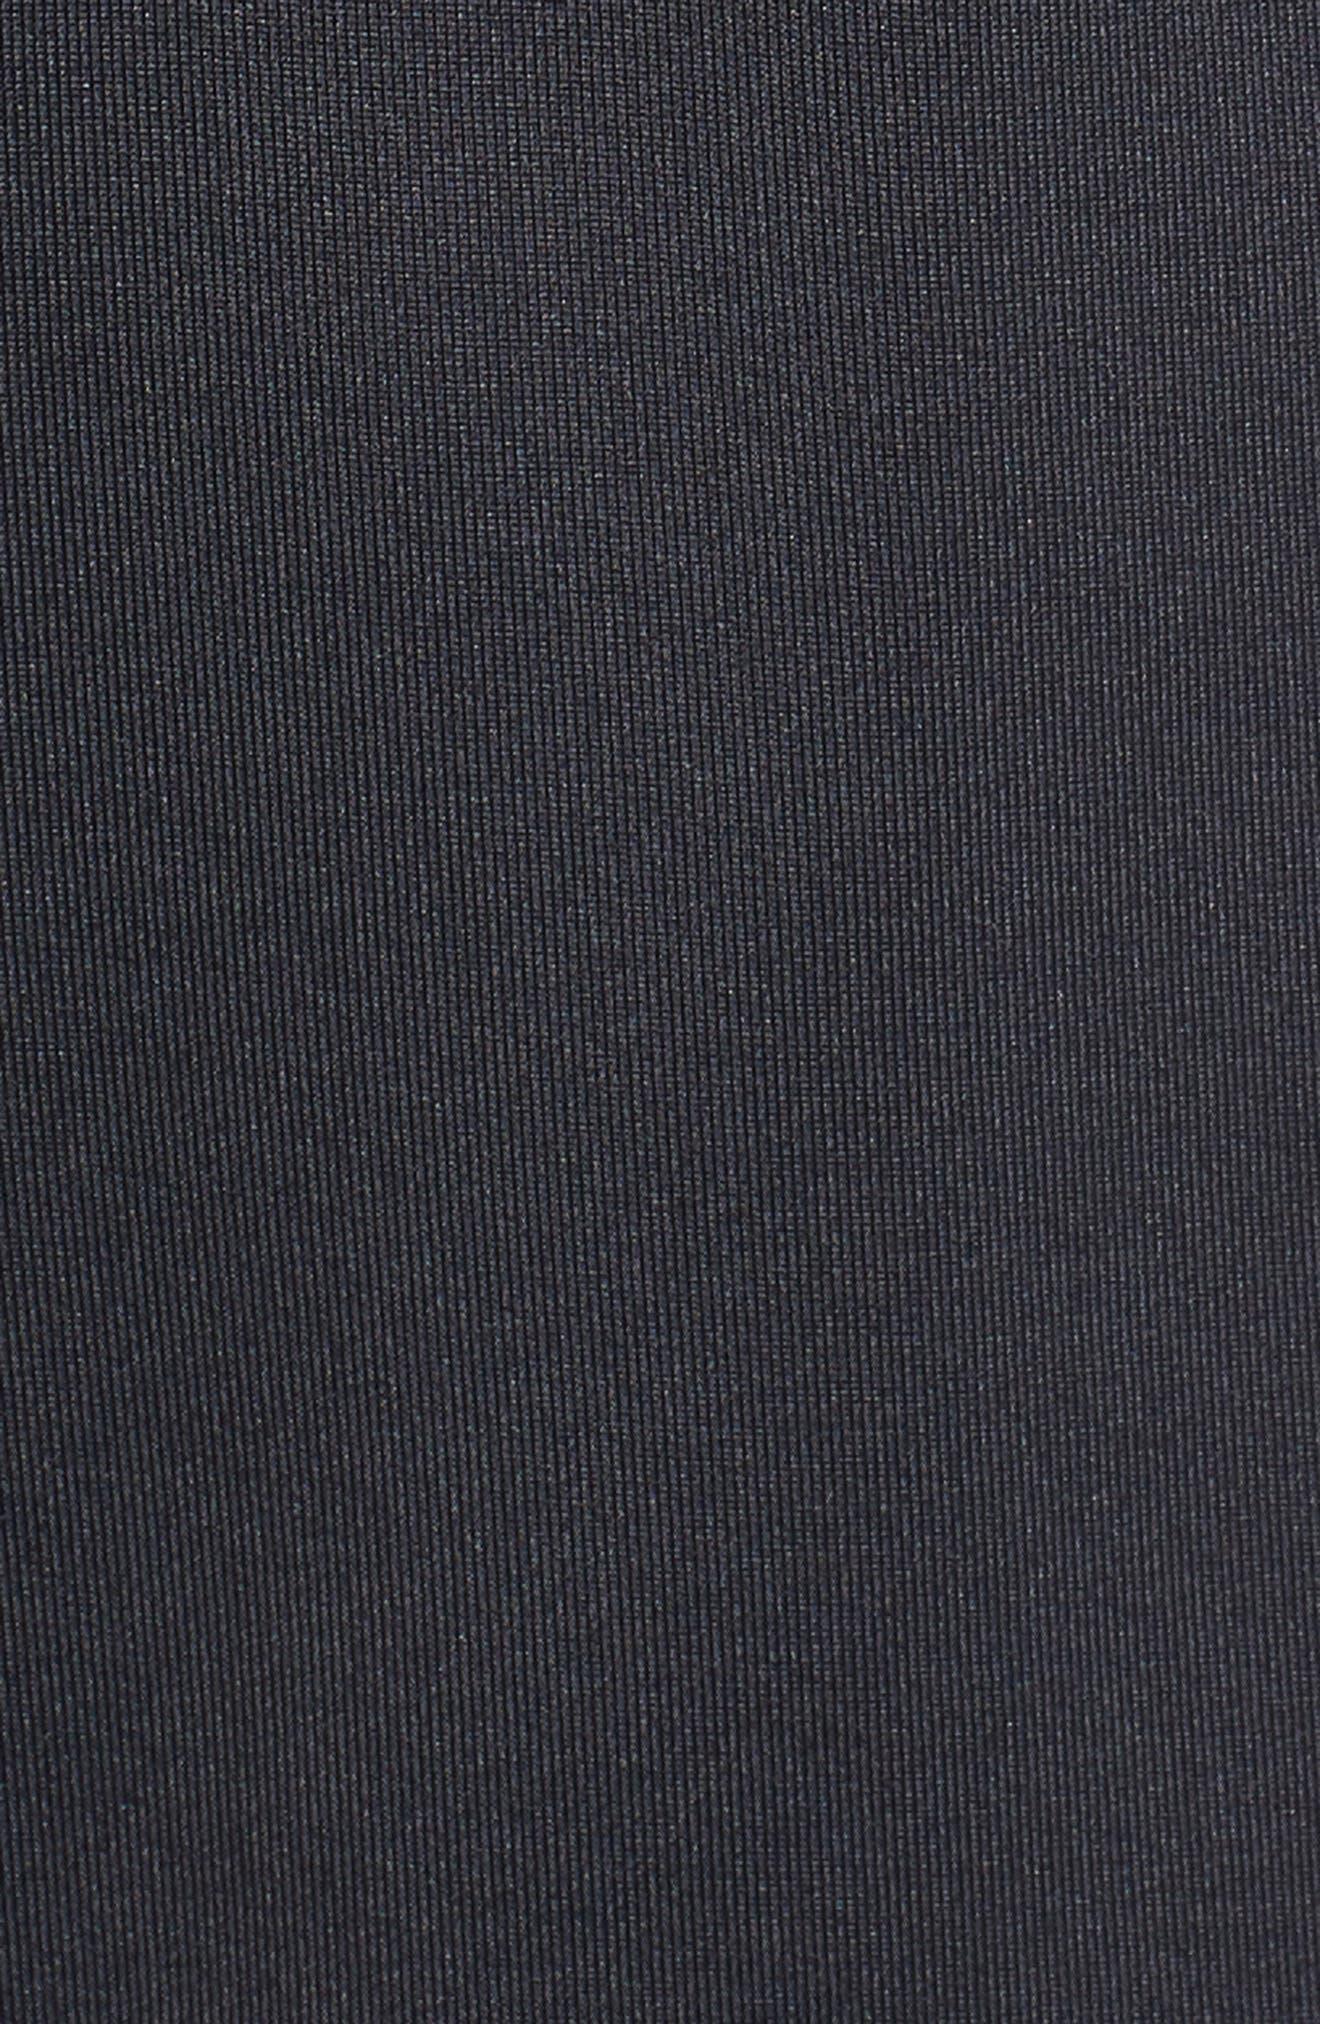 SB Hype Icon Shorts,                             Alternate thumbnail 5, color,                             CARBON/ BLACK